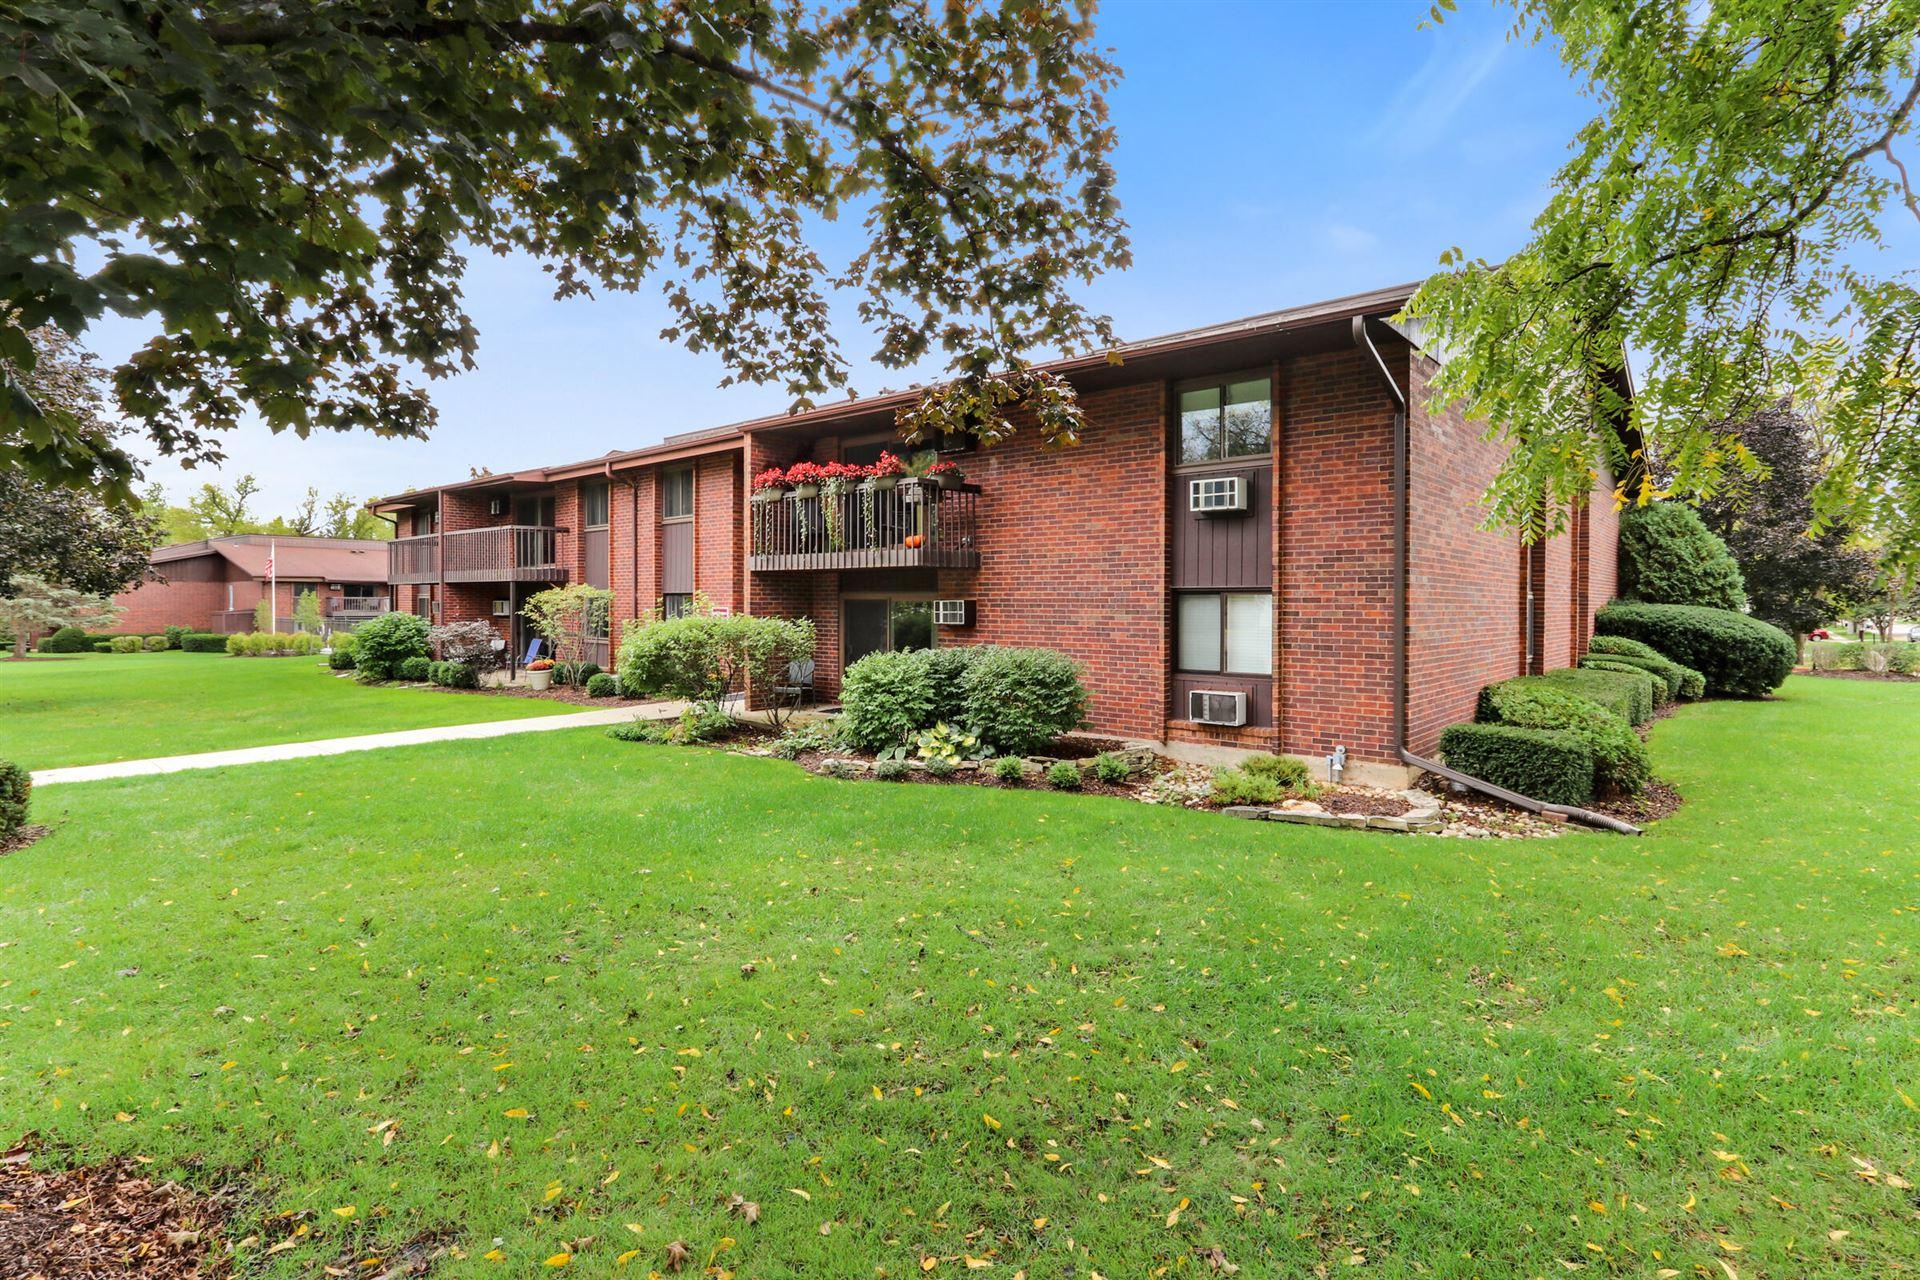 1270 Wisconsin St #209A, Lake Geneva, WI 53147 - MLS#: 1768133